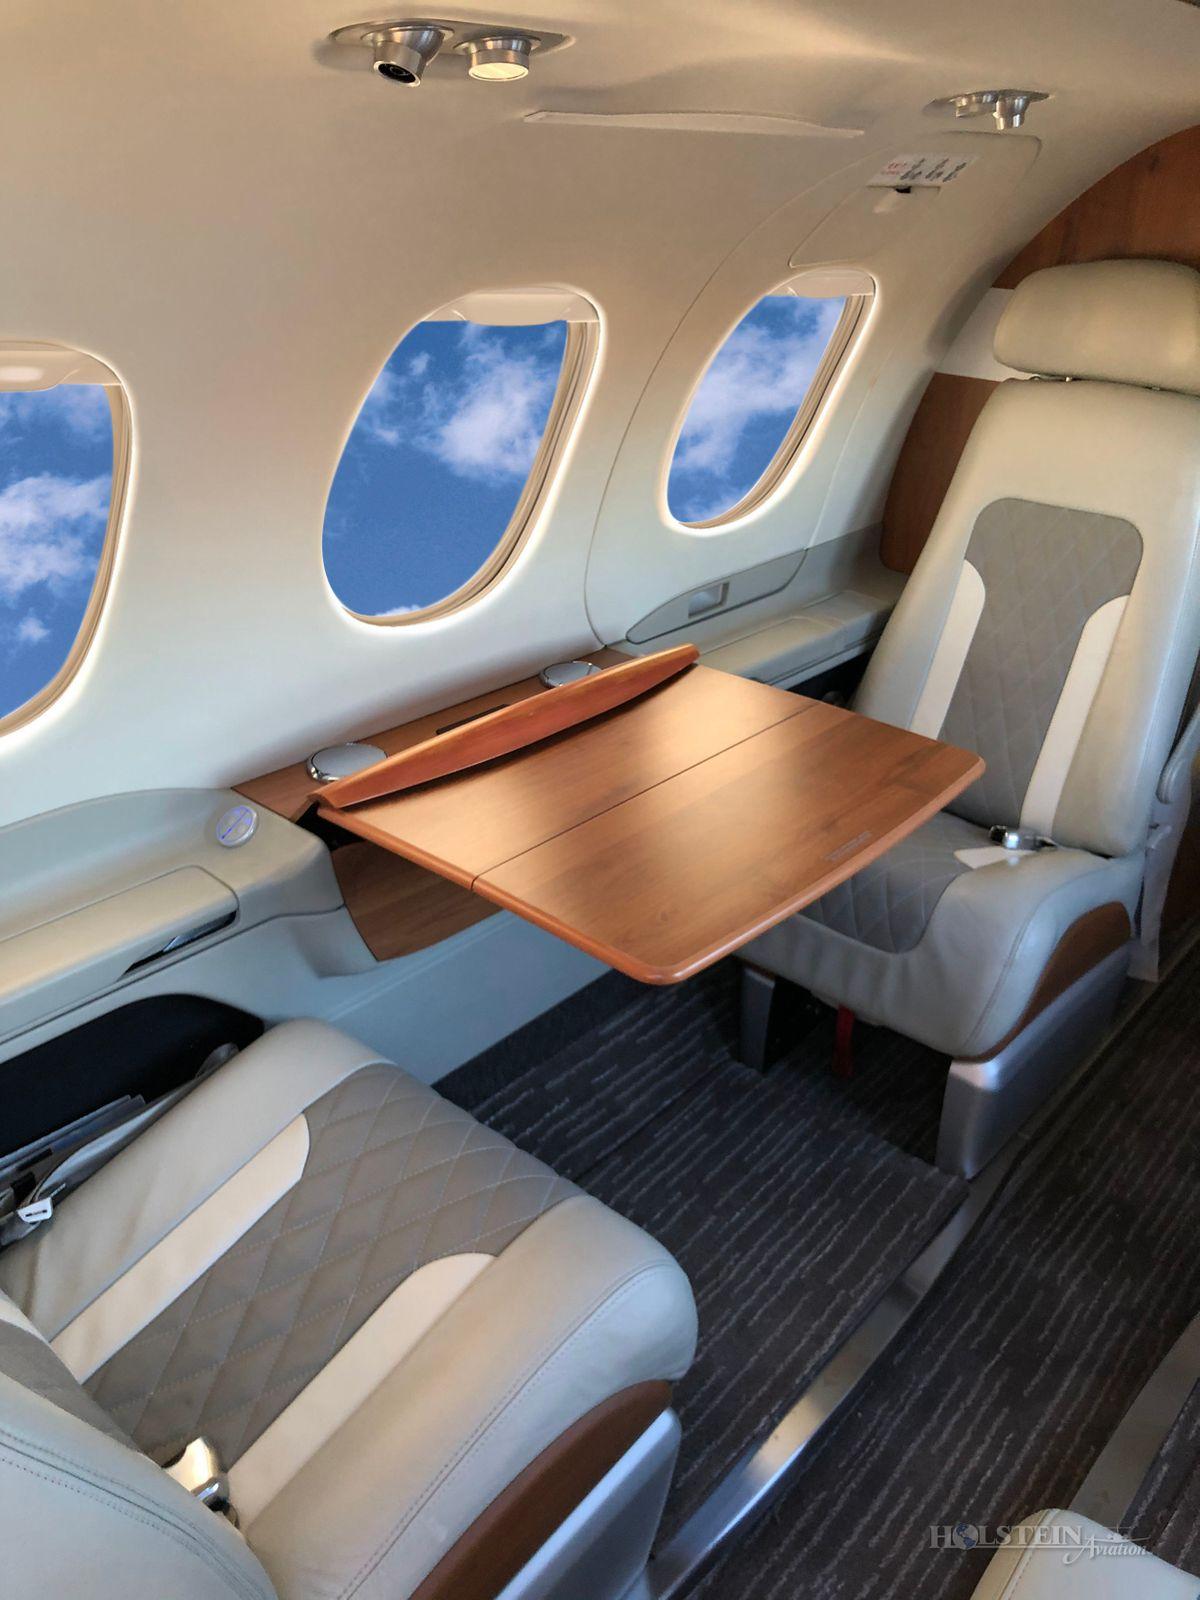 2011 Embraer Phenom 100 - 50000237 - N468St - Int - Tbl Ext RGB.jpg